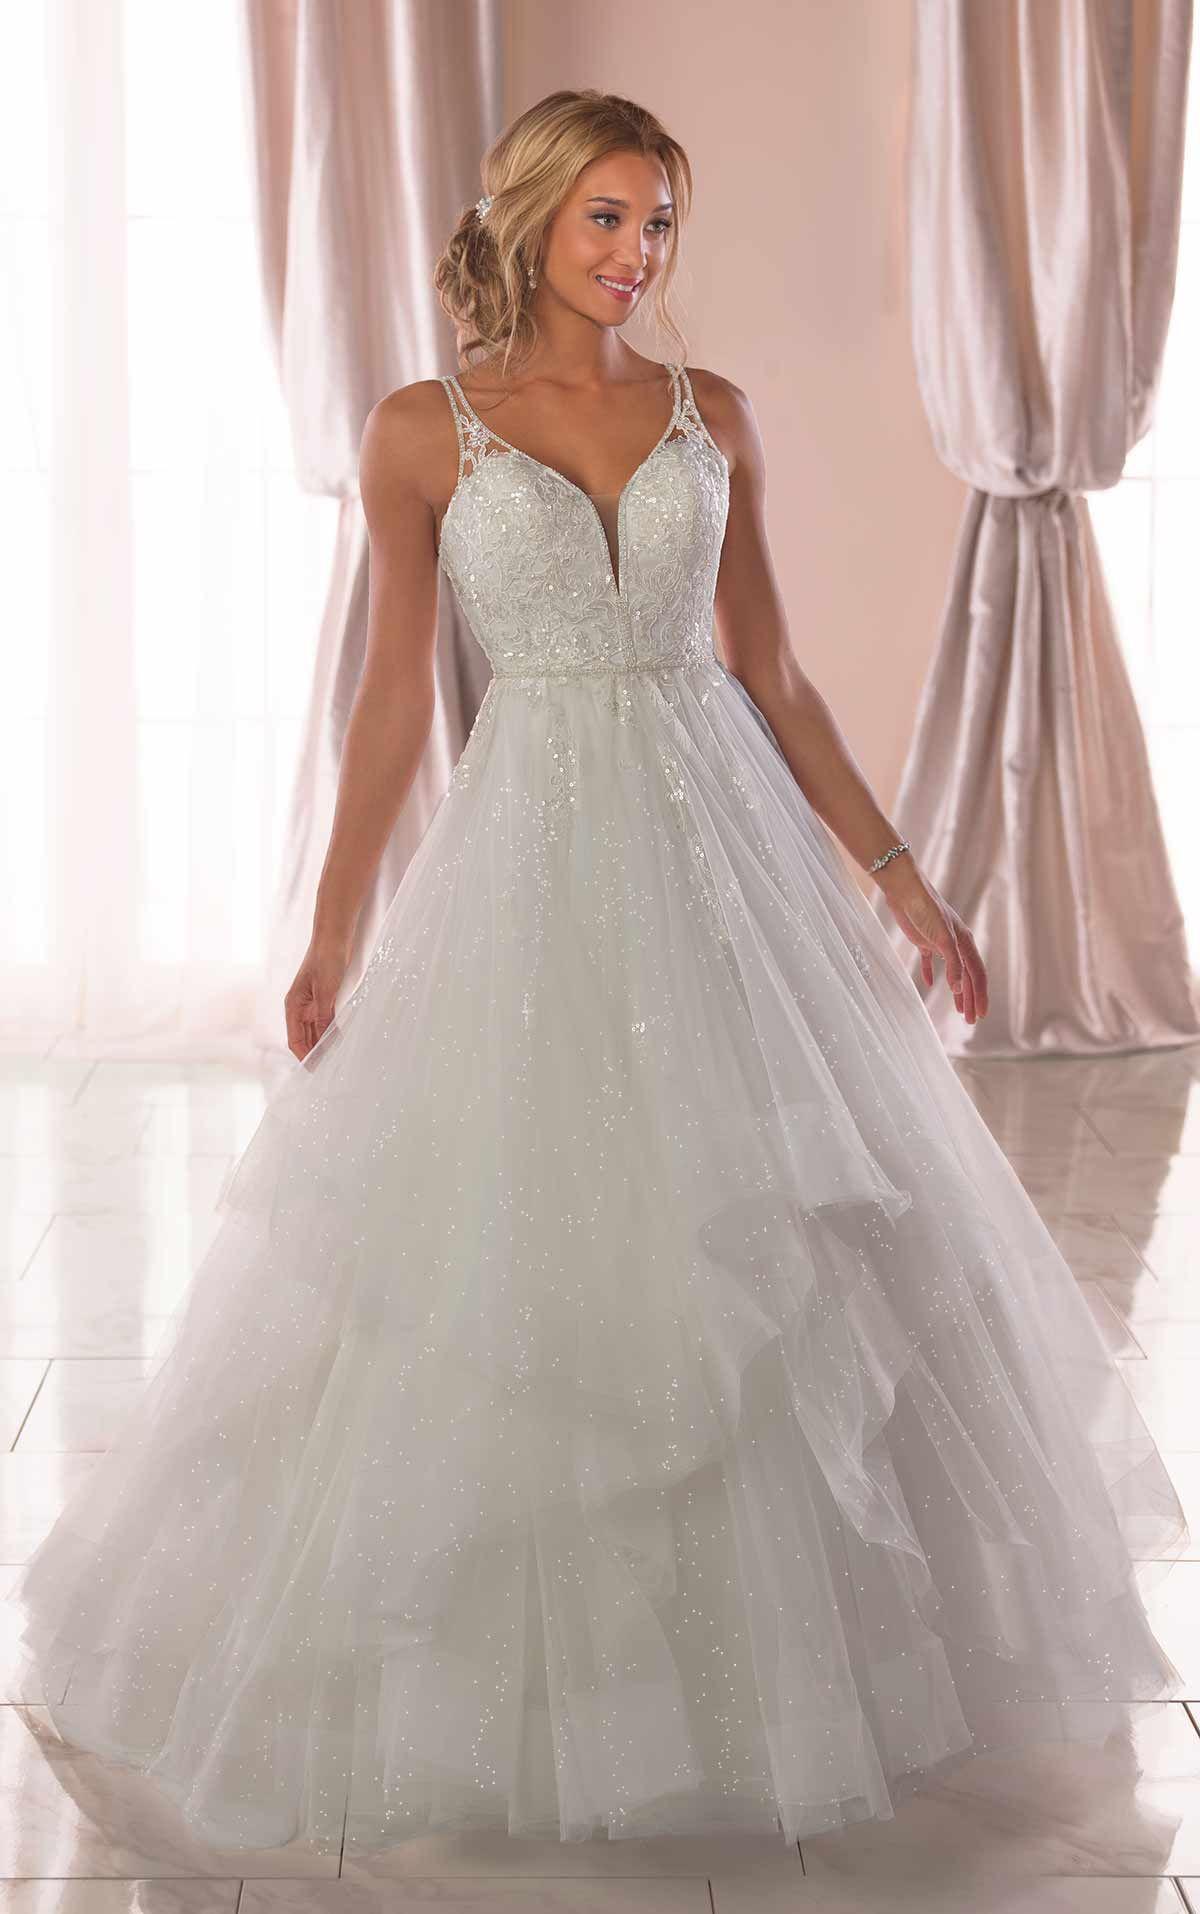 Lace Bodice Shimmer Tulle Wedding Dress Lace Sparkle Wedding Dress Bride Elegancebysarah Sparkle Wedding Dress Bodice Wedding Dress Glitter Wedding Dress [ 1914 x 1200 Pixel ]